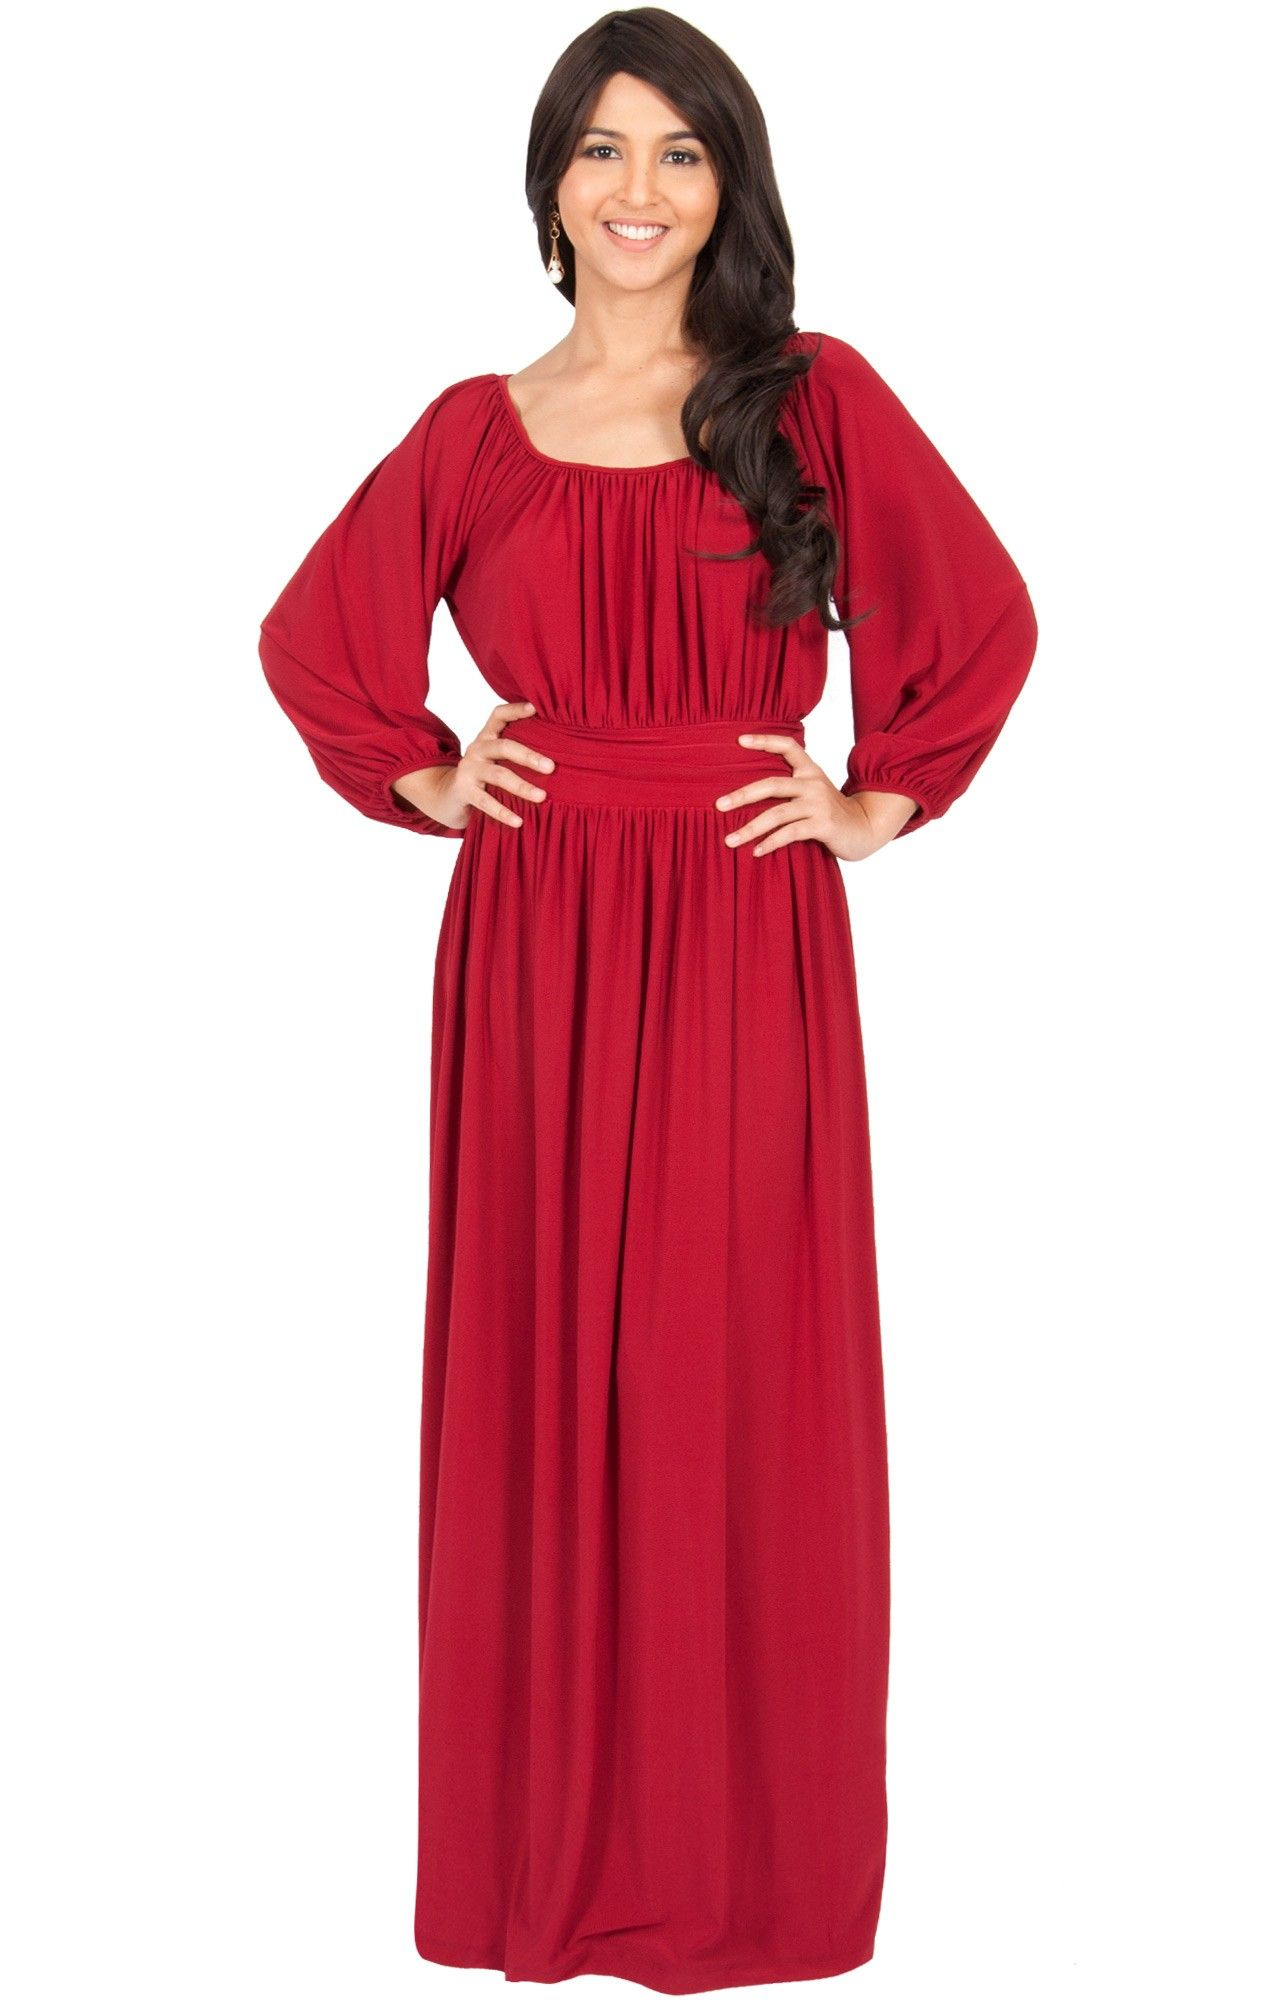 15a2b2261a17 FRANNY - Long Sleeve Peasant Casual Flowy Fall Modest Maxi Dress ...